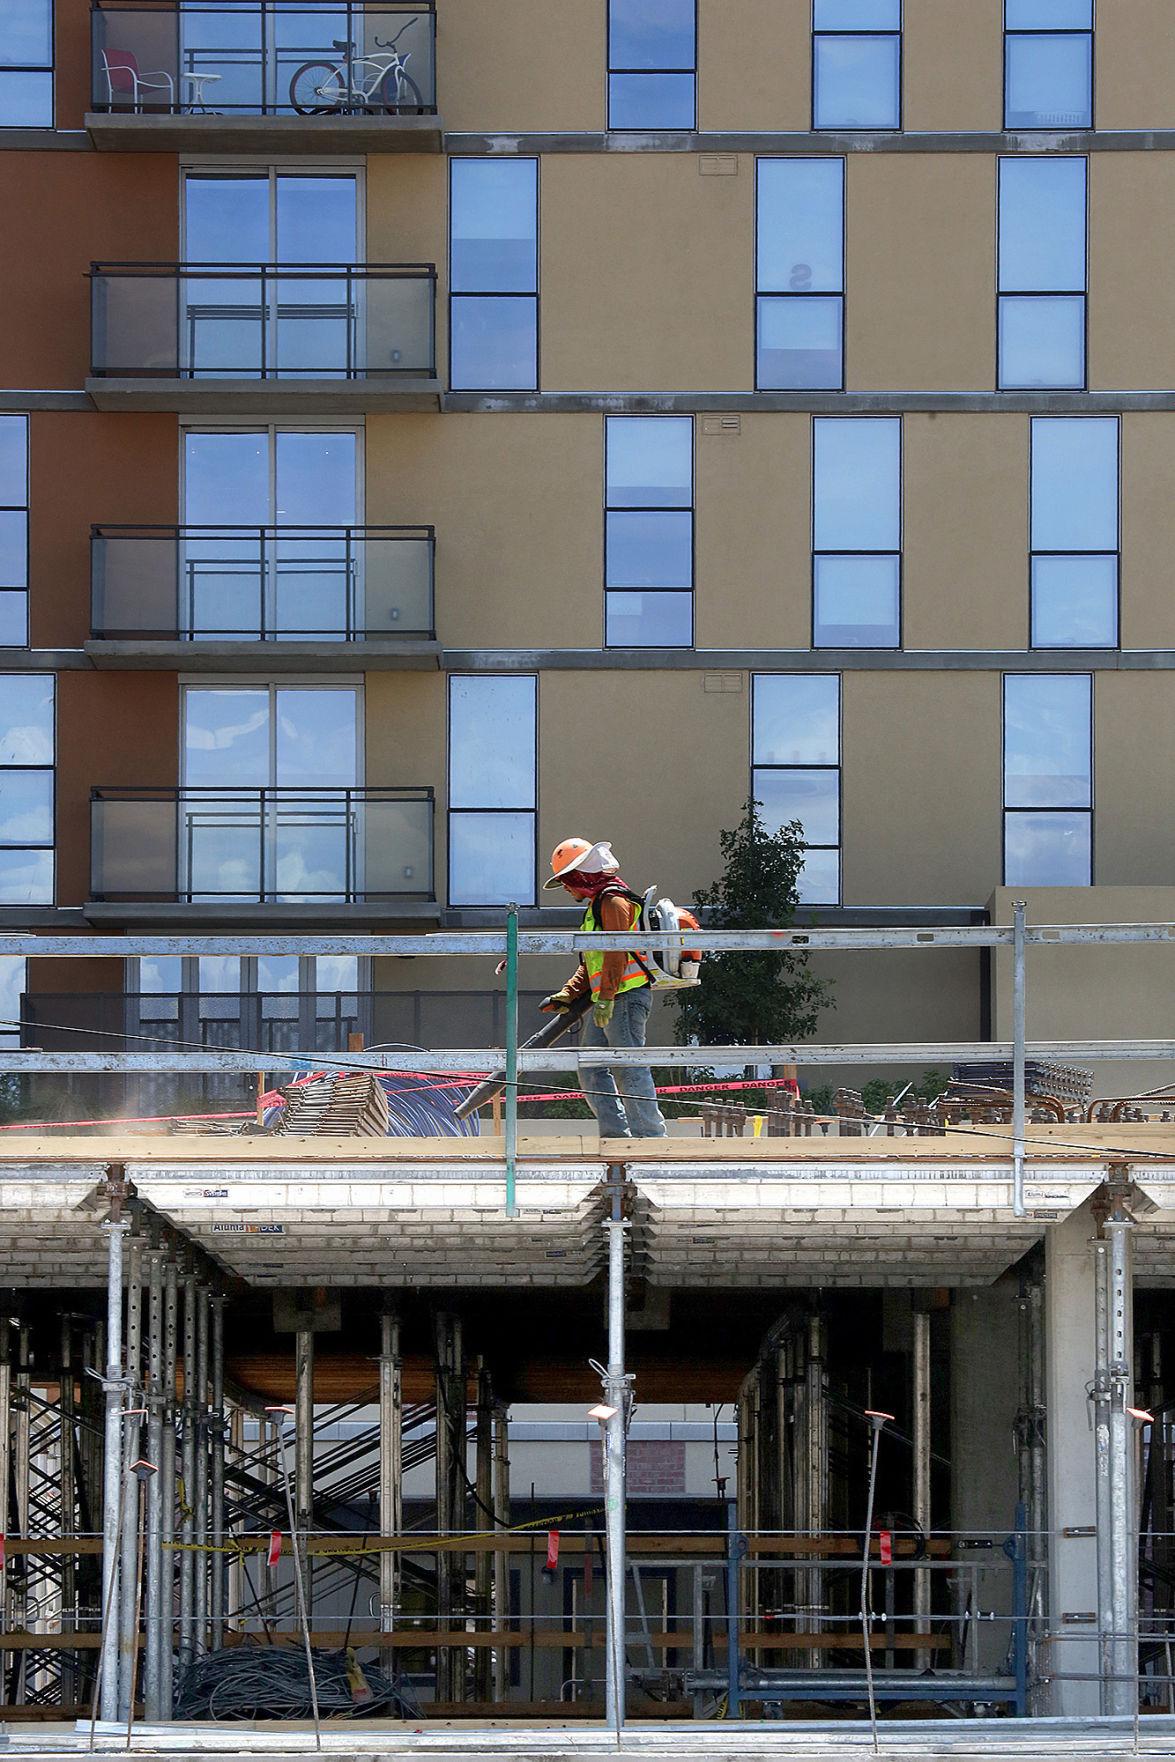 Hub high rise getting smaller companion near ua news for The hub tucson apartments